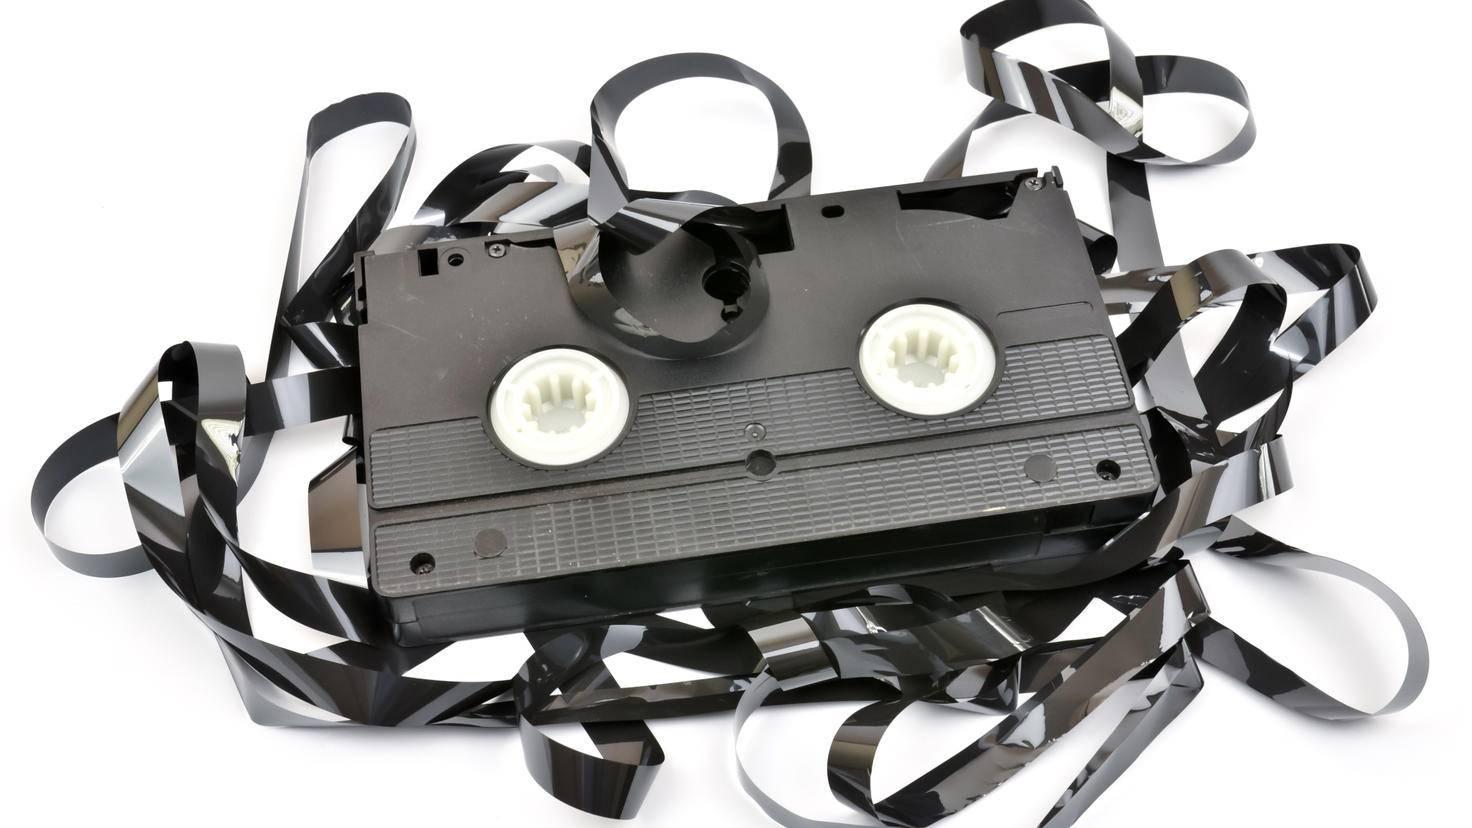 vhs-kassette-bandsalat